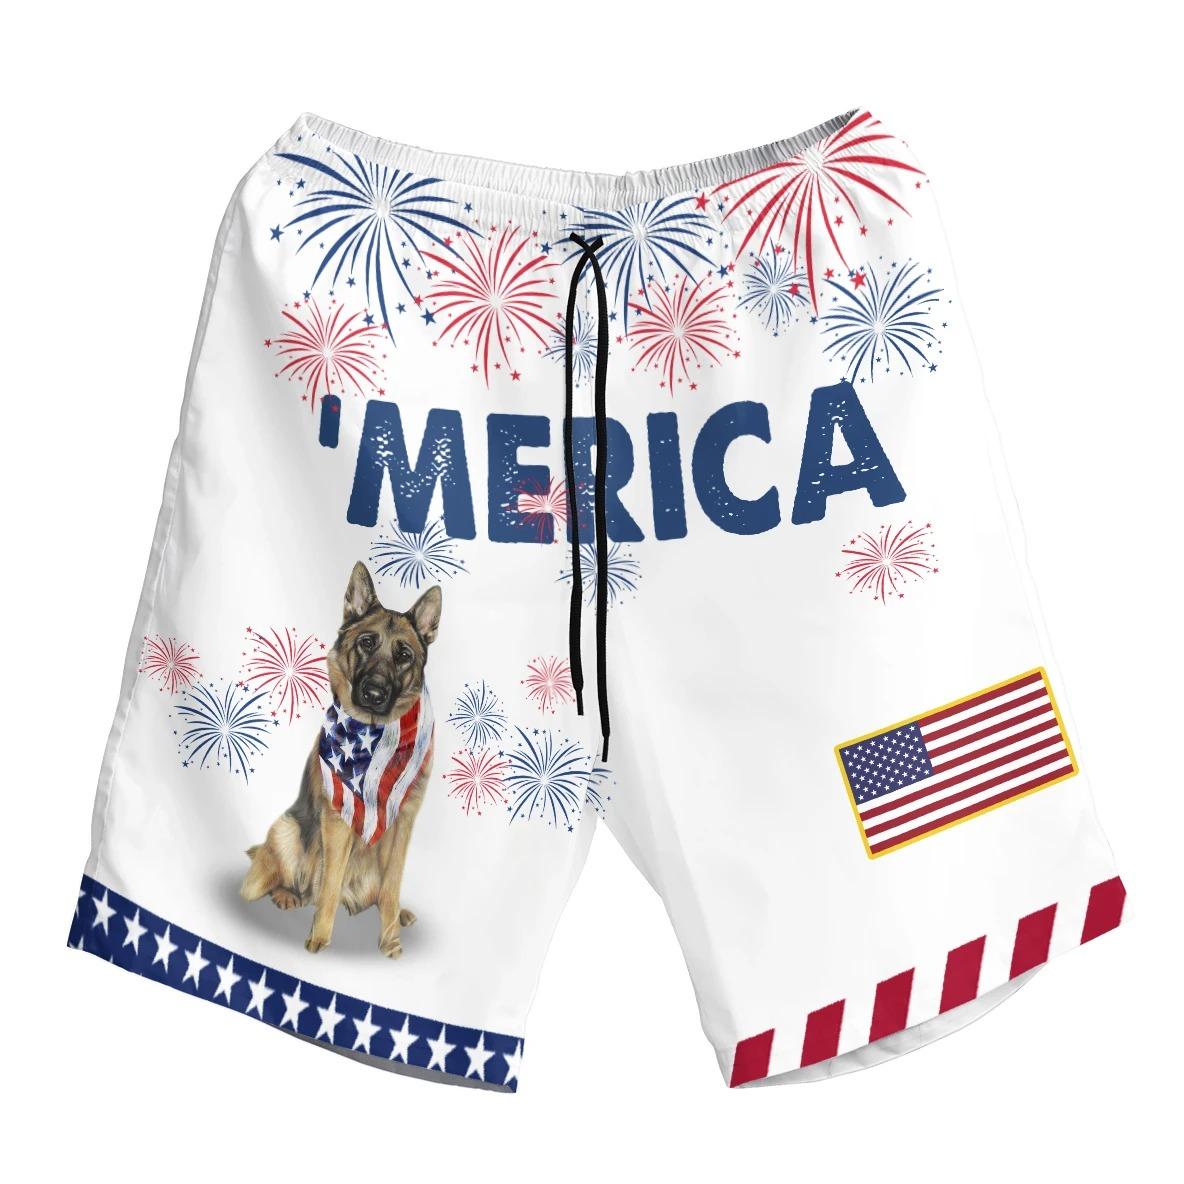 American Alsace Dog German Shepherd Hwaiian Shirt And Short